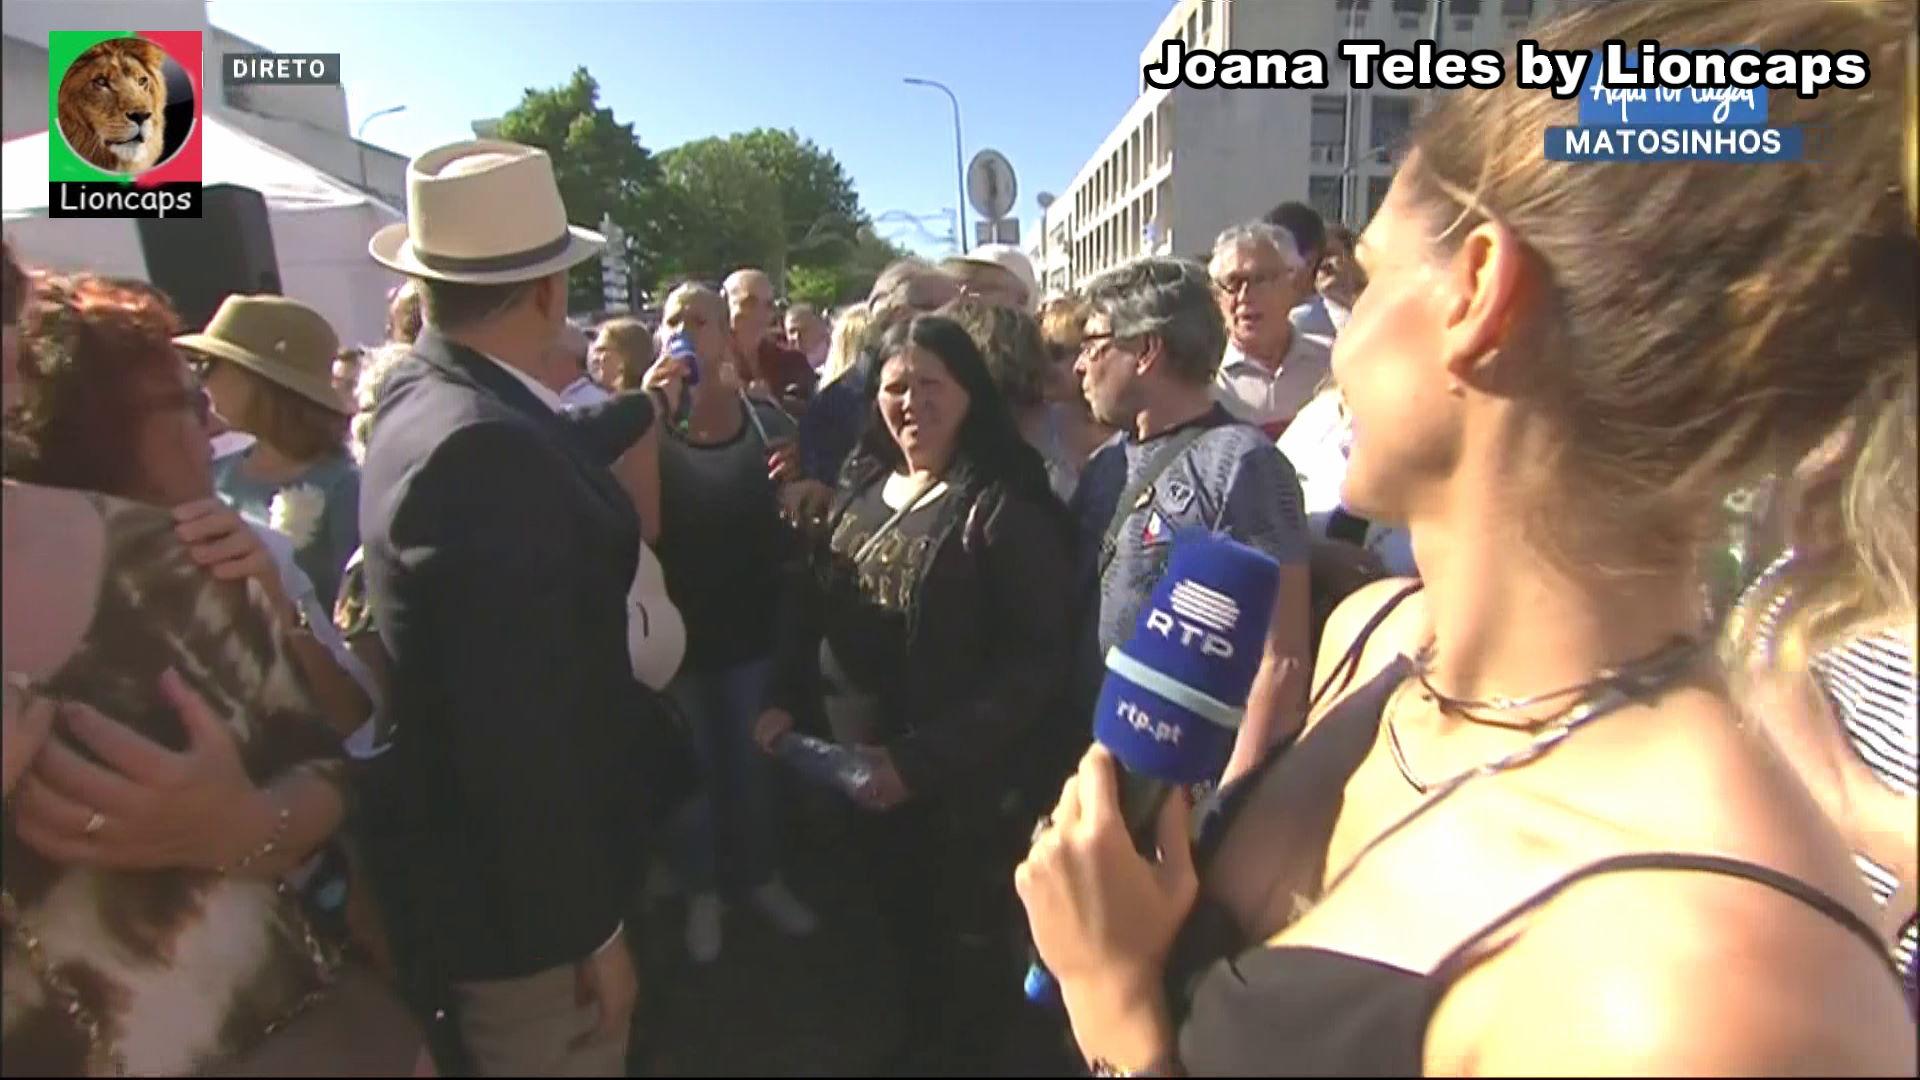 976676215_joana_teles_vs200125_1169_122_28lo.JPG